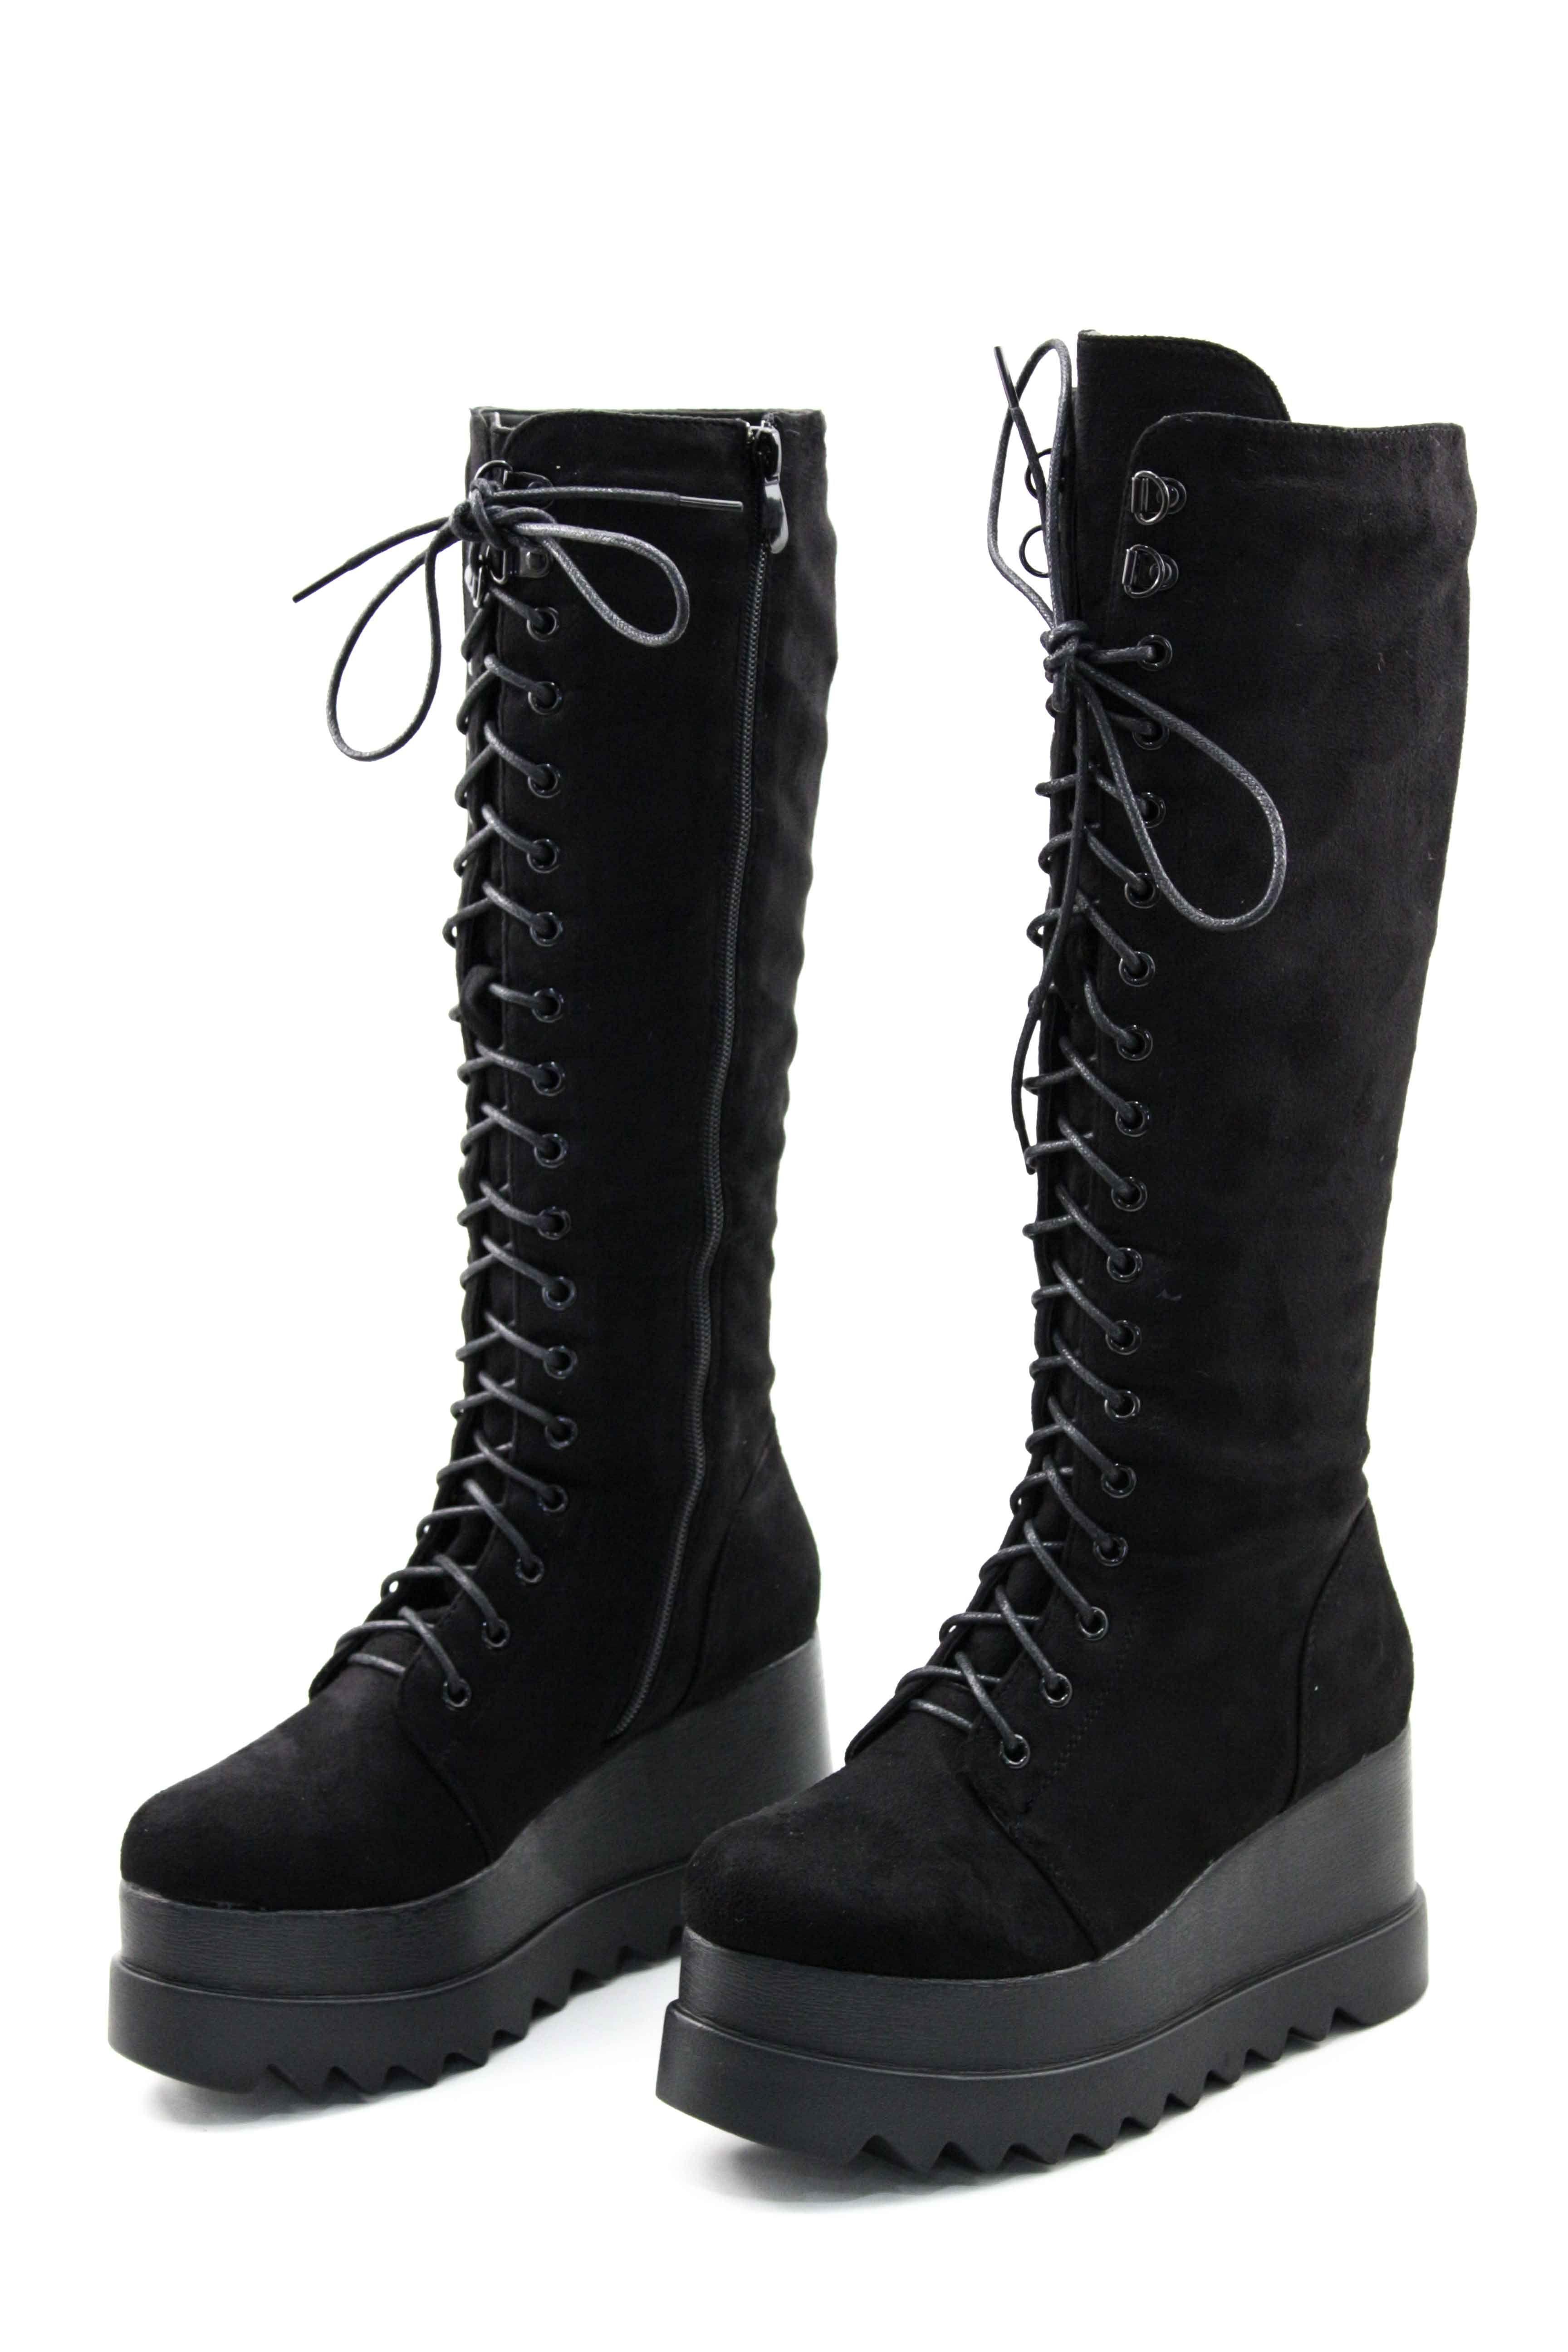 63c355cec24 Γυναικειεσ μποτεσ πλατφορμεσ μαυρεσ | Shadow wallk | Shoes, Boots ...